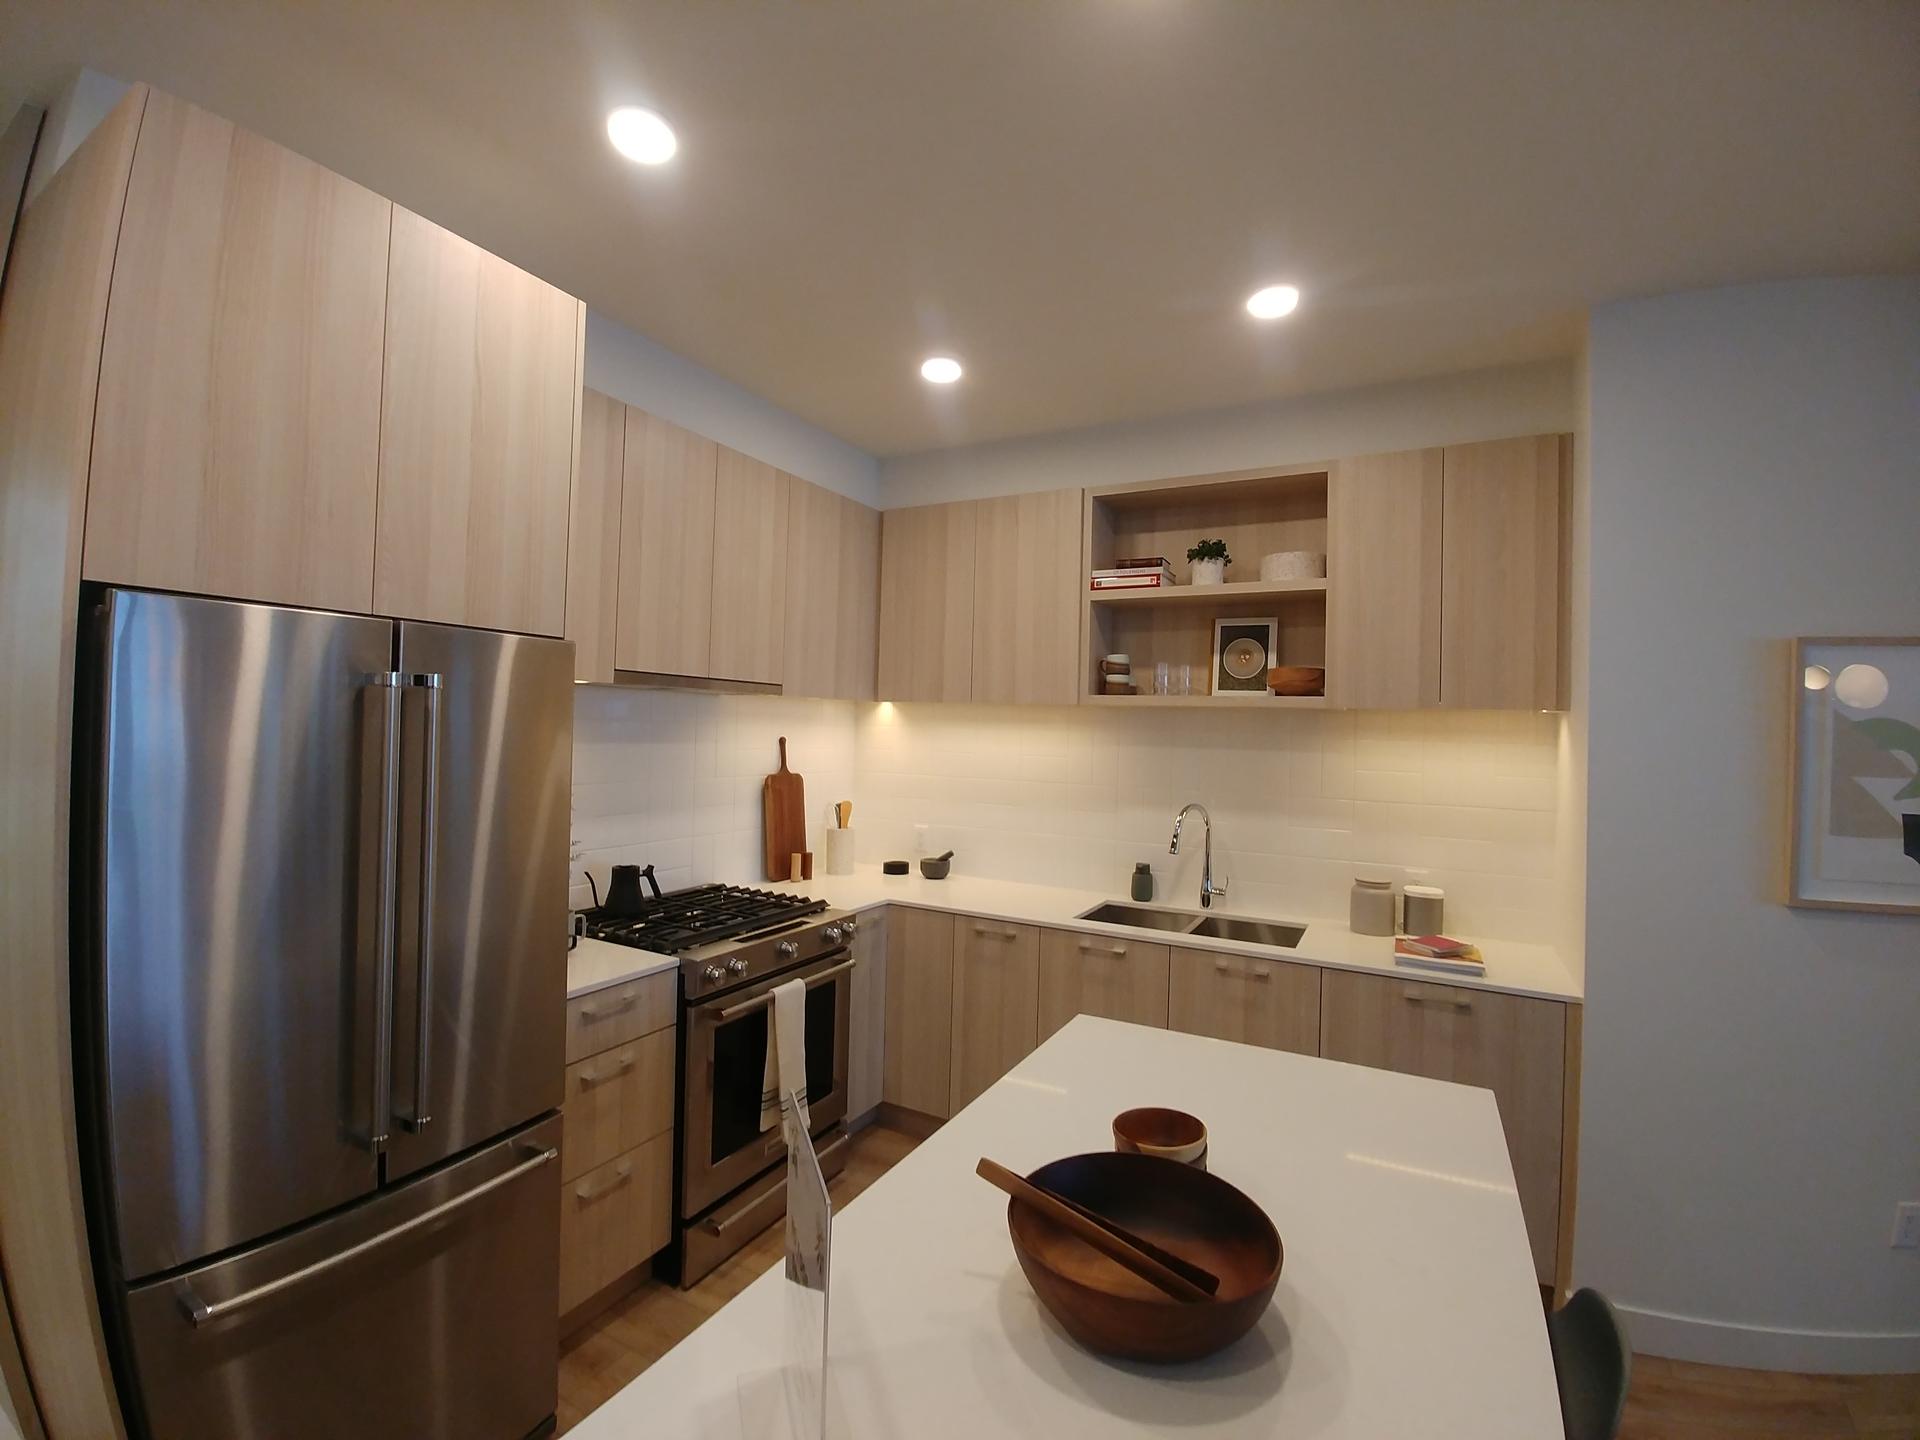 The Oaks- Kitchen-Dining- light colour scheme at The Oaks (731 Anskar Court, Coquitlam West, Coquitlam)